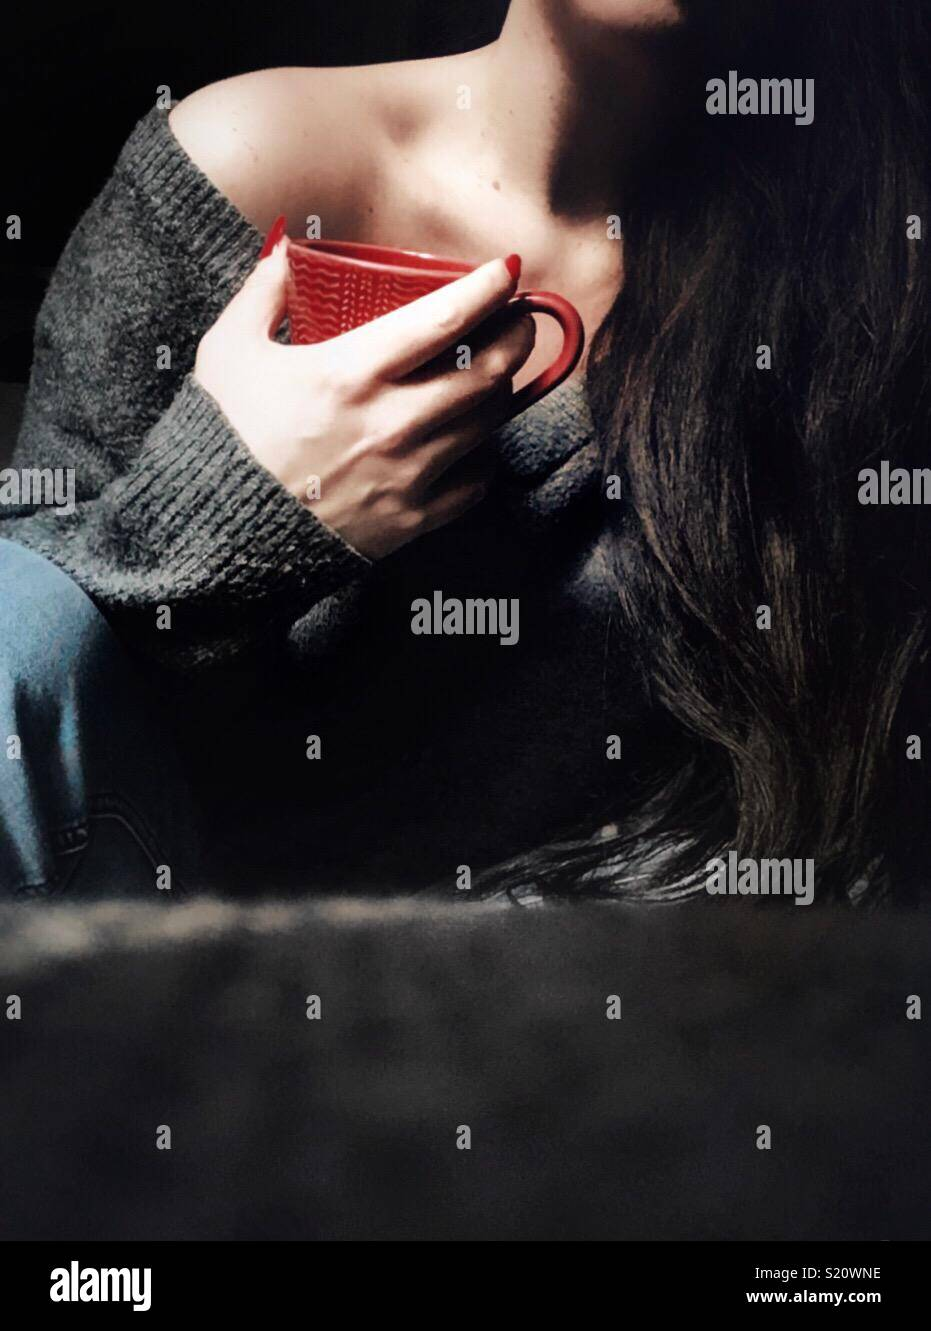 Frau mit langen dunklen Haaren rote Schale Stockbild